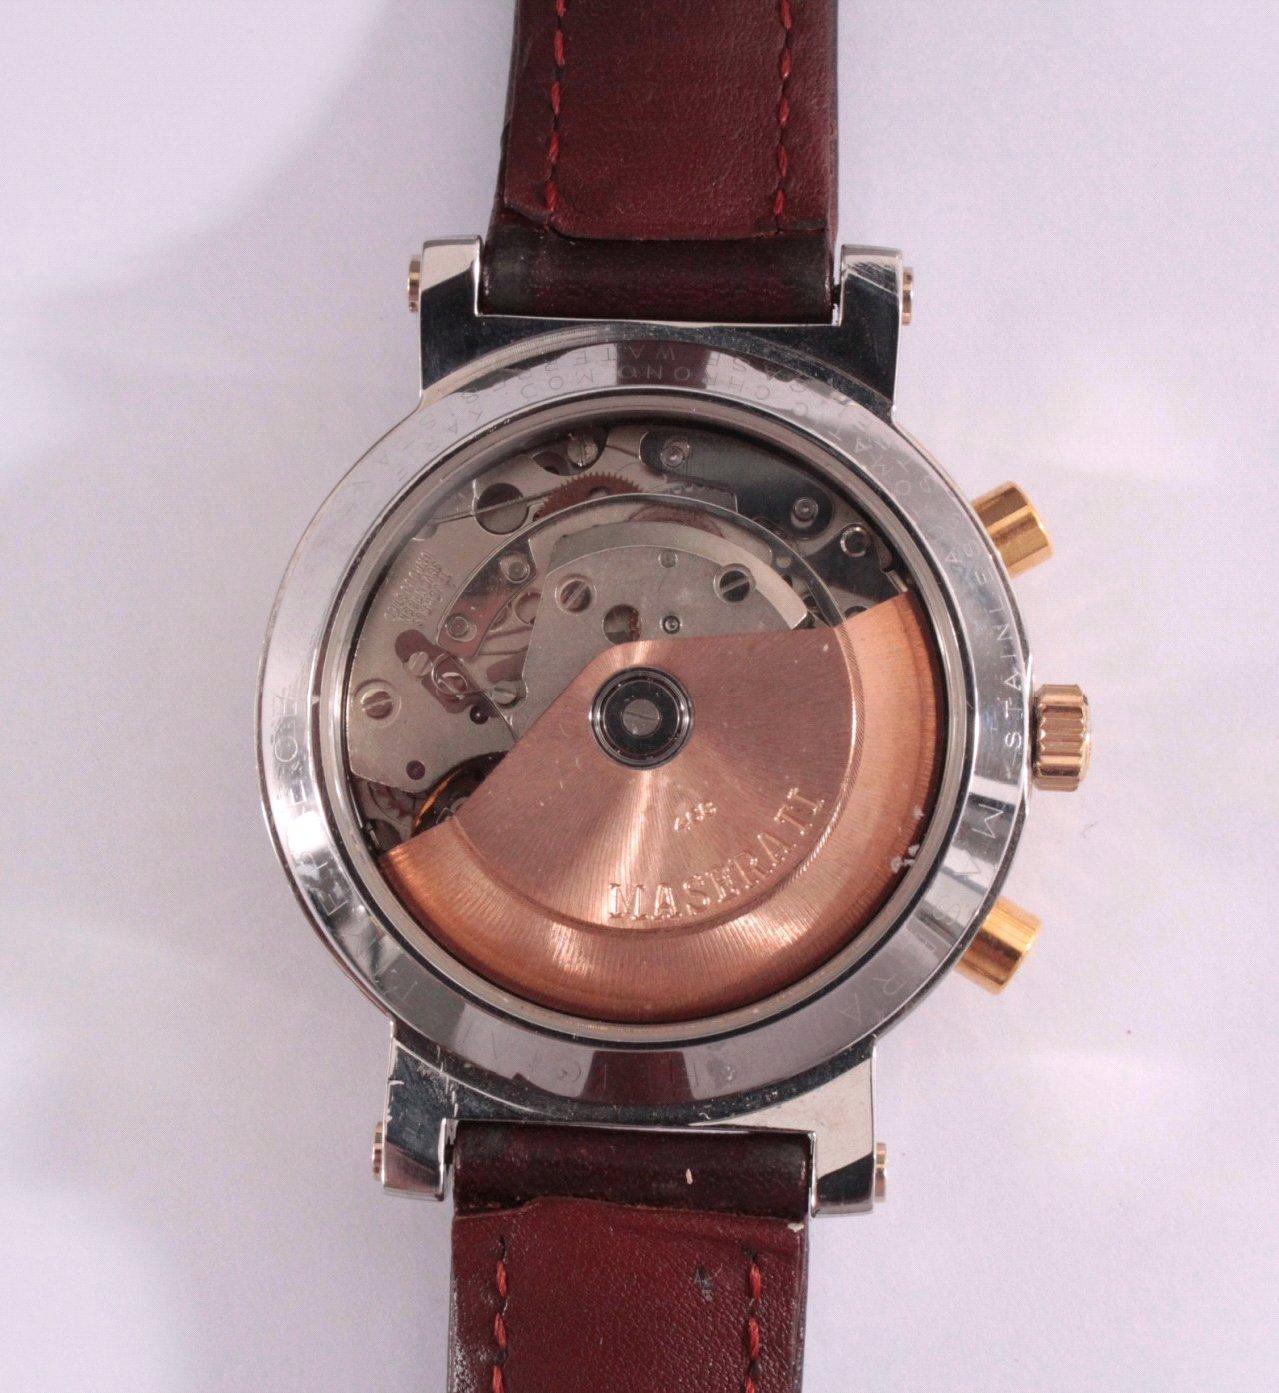 Armbanduhr Maserati Official Timepiece, Modell Karif-3